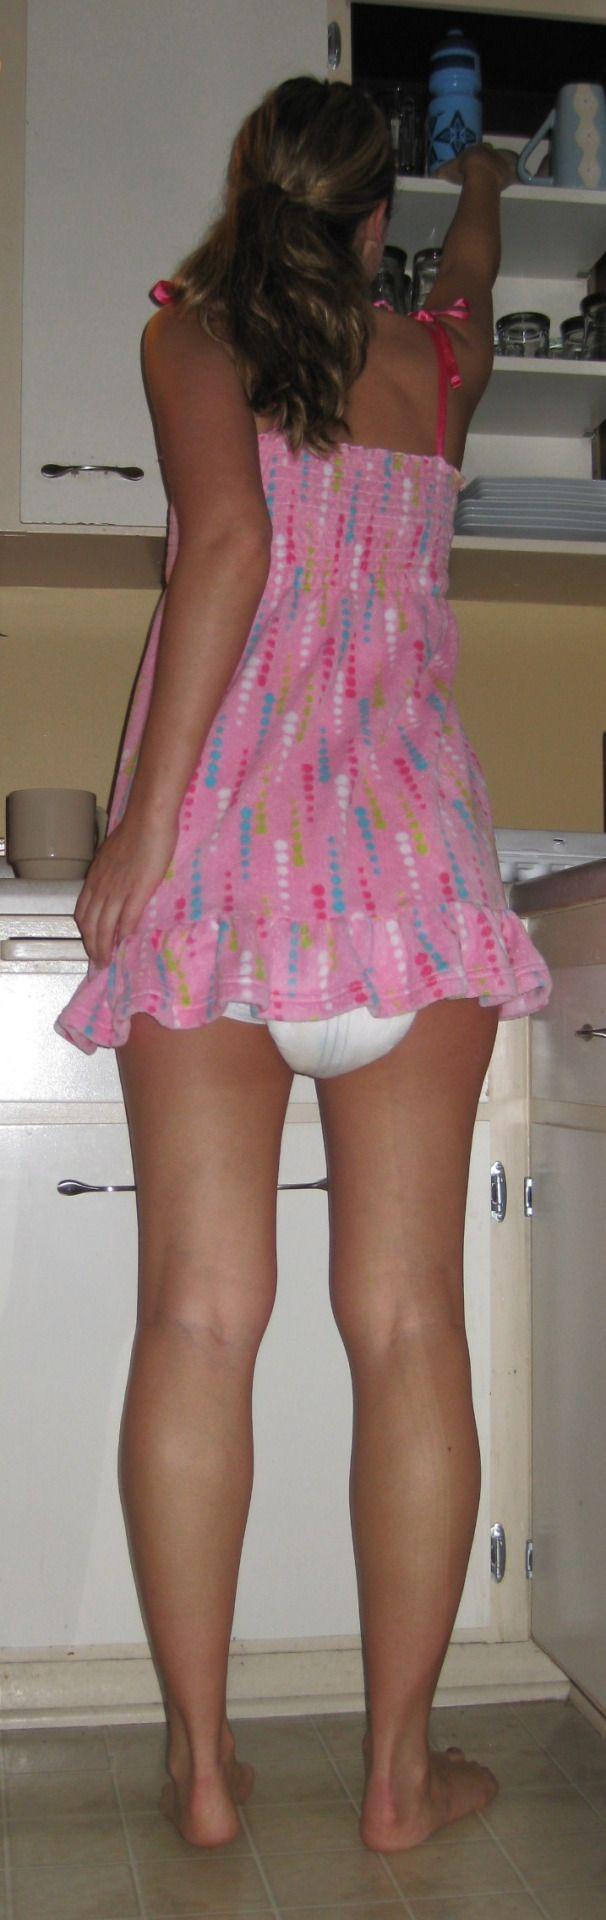 Peeing ladies diaper